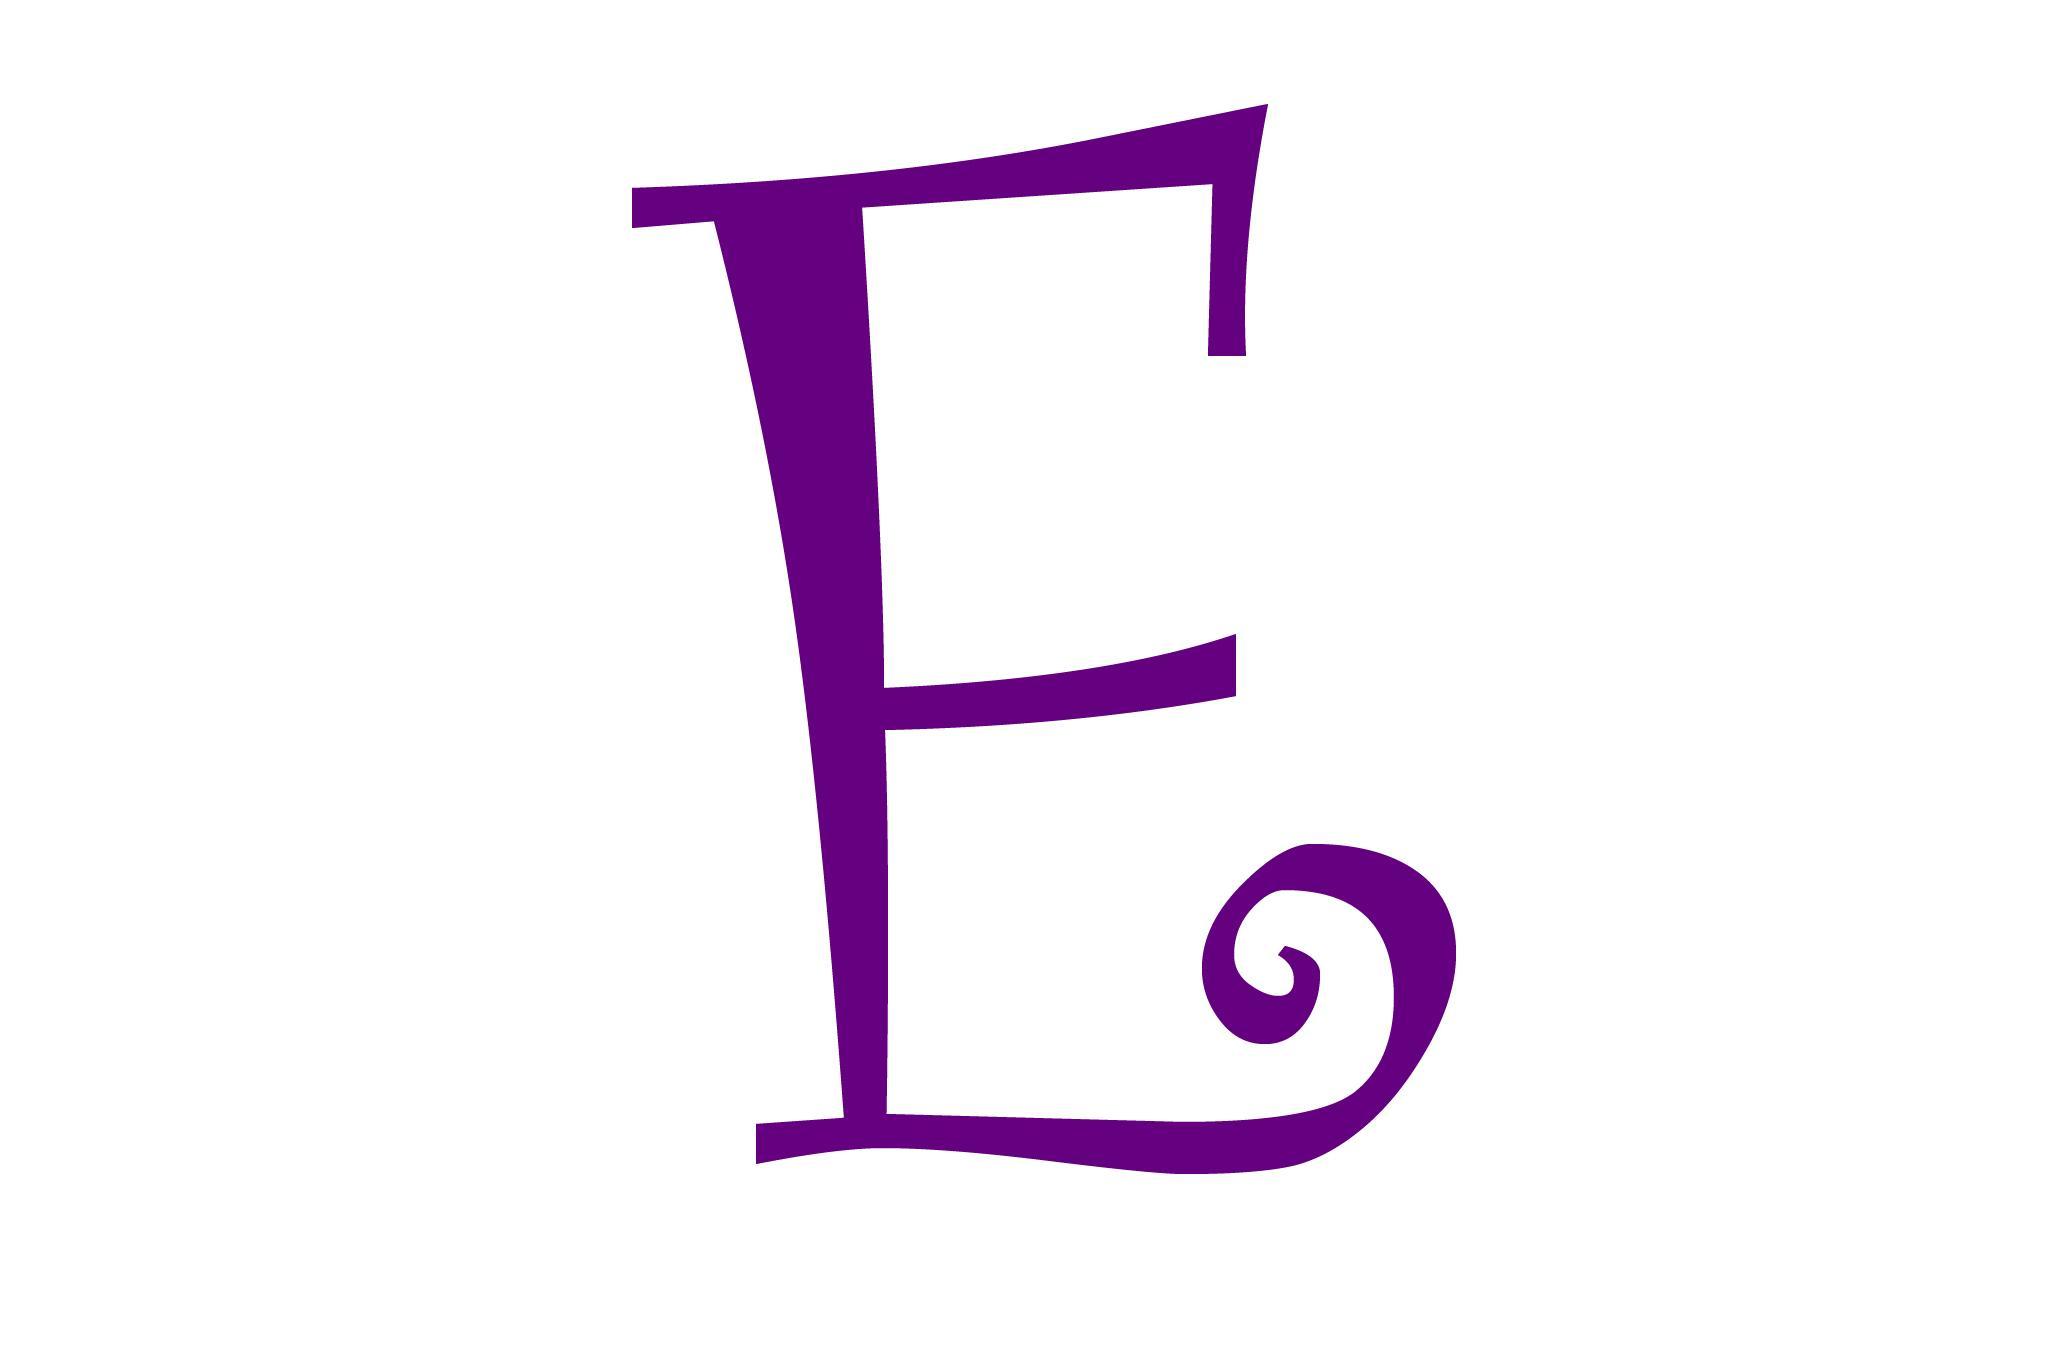 3 nombres cortos de niño que empiezan por E